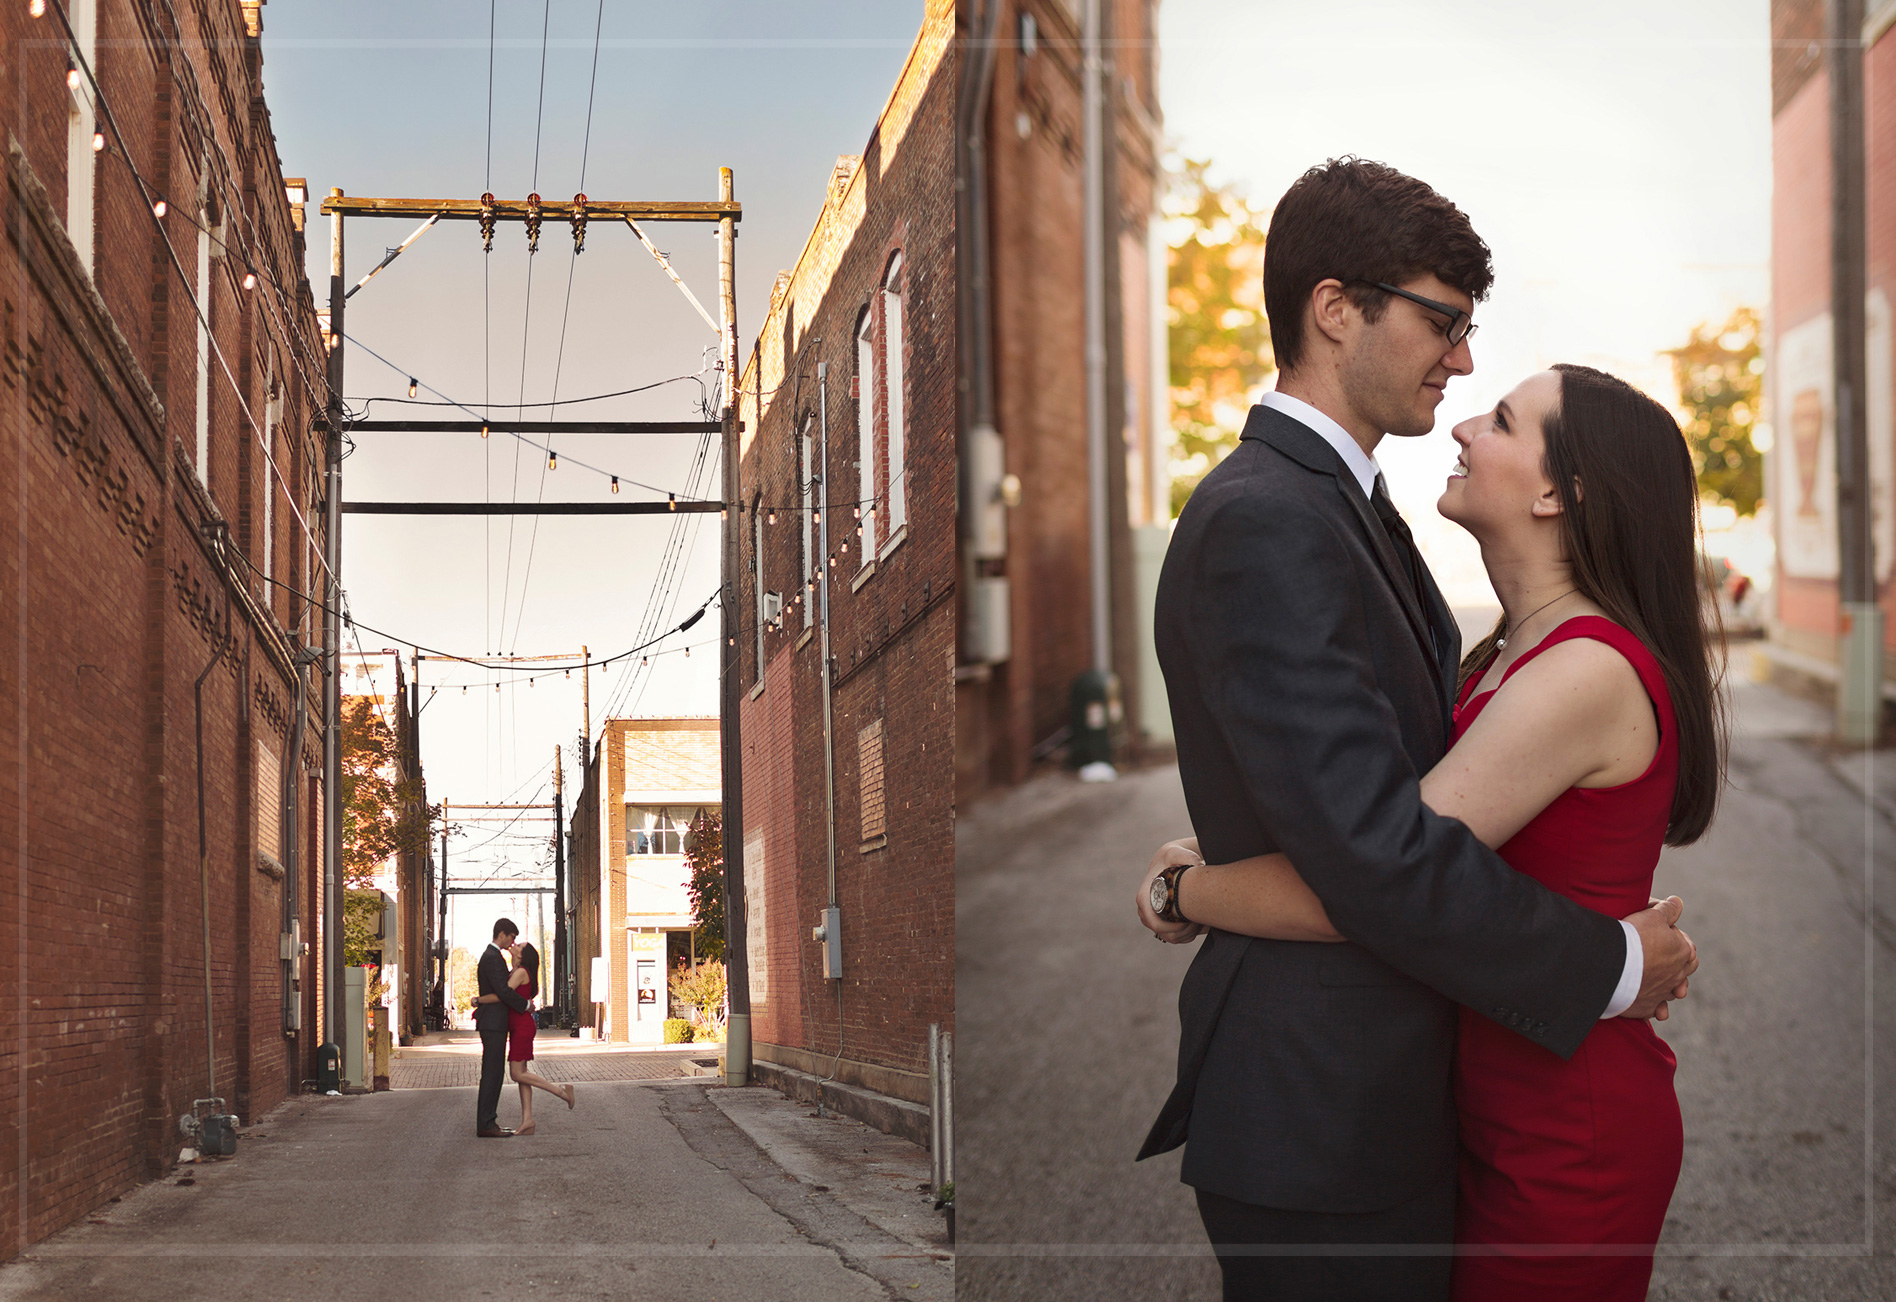 northwest-arkansas-rogers-bentonville-engagement-couples-photo-session-sunny-skaggs-photography.jpg